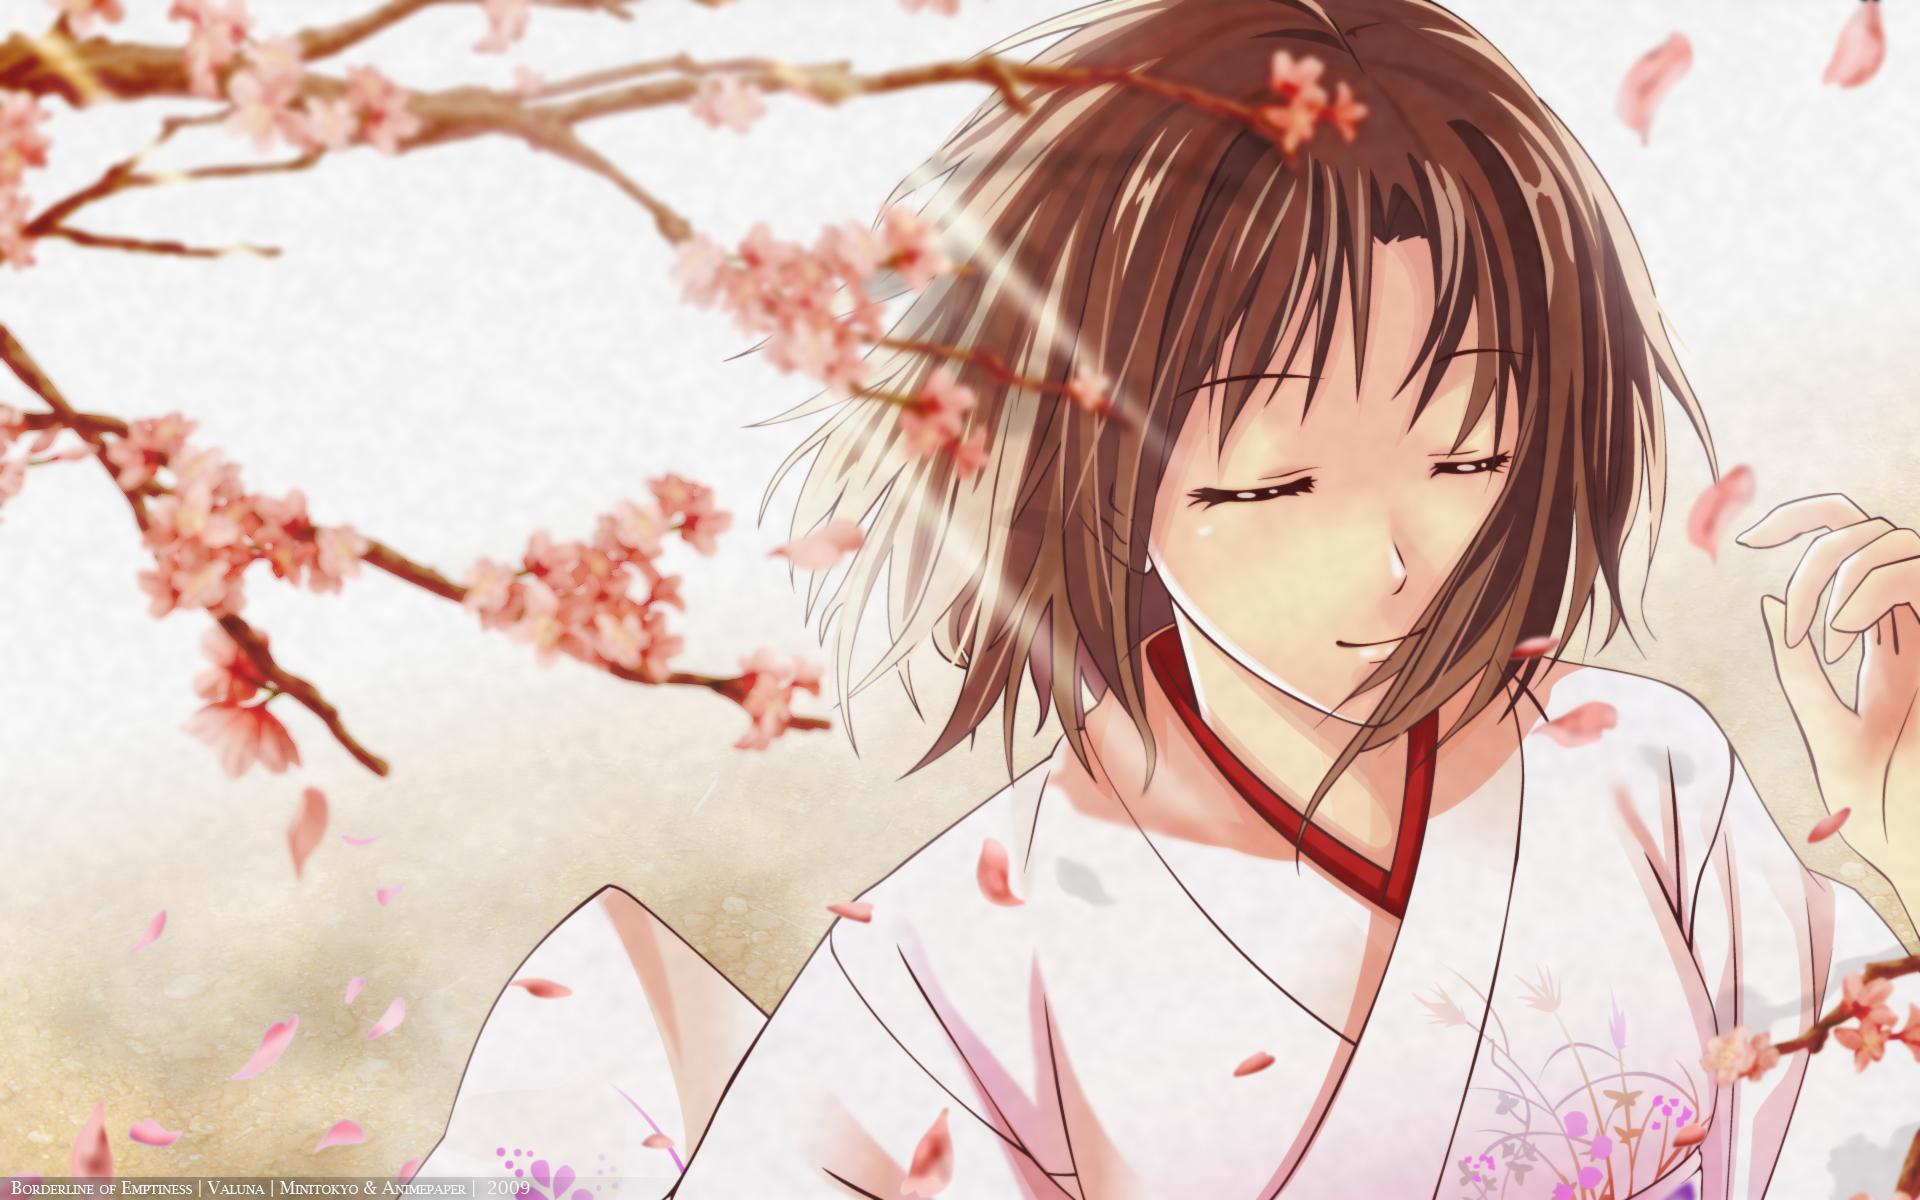 cherry_blossoms chobipero flowers japanese_clothes kara_no_kyoukai petals ryougi_shiki